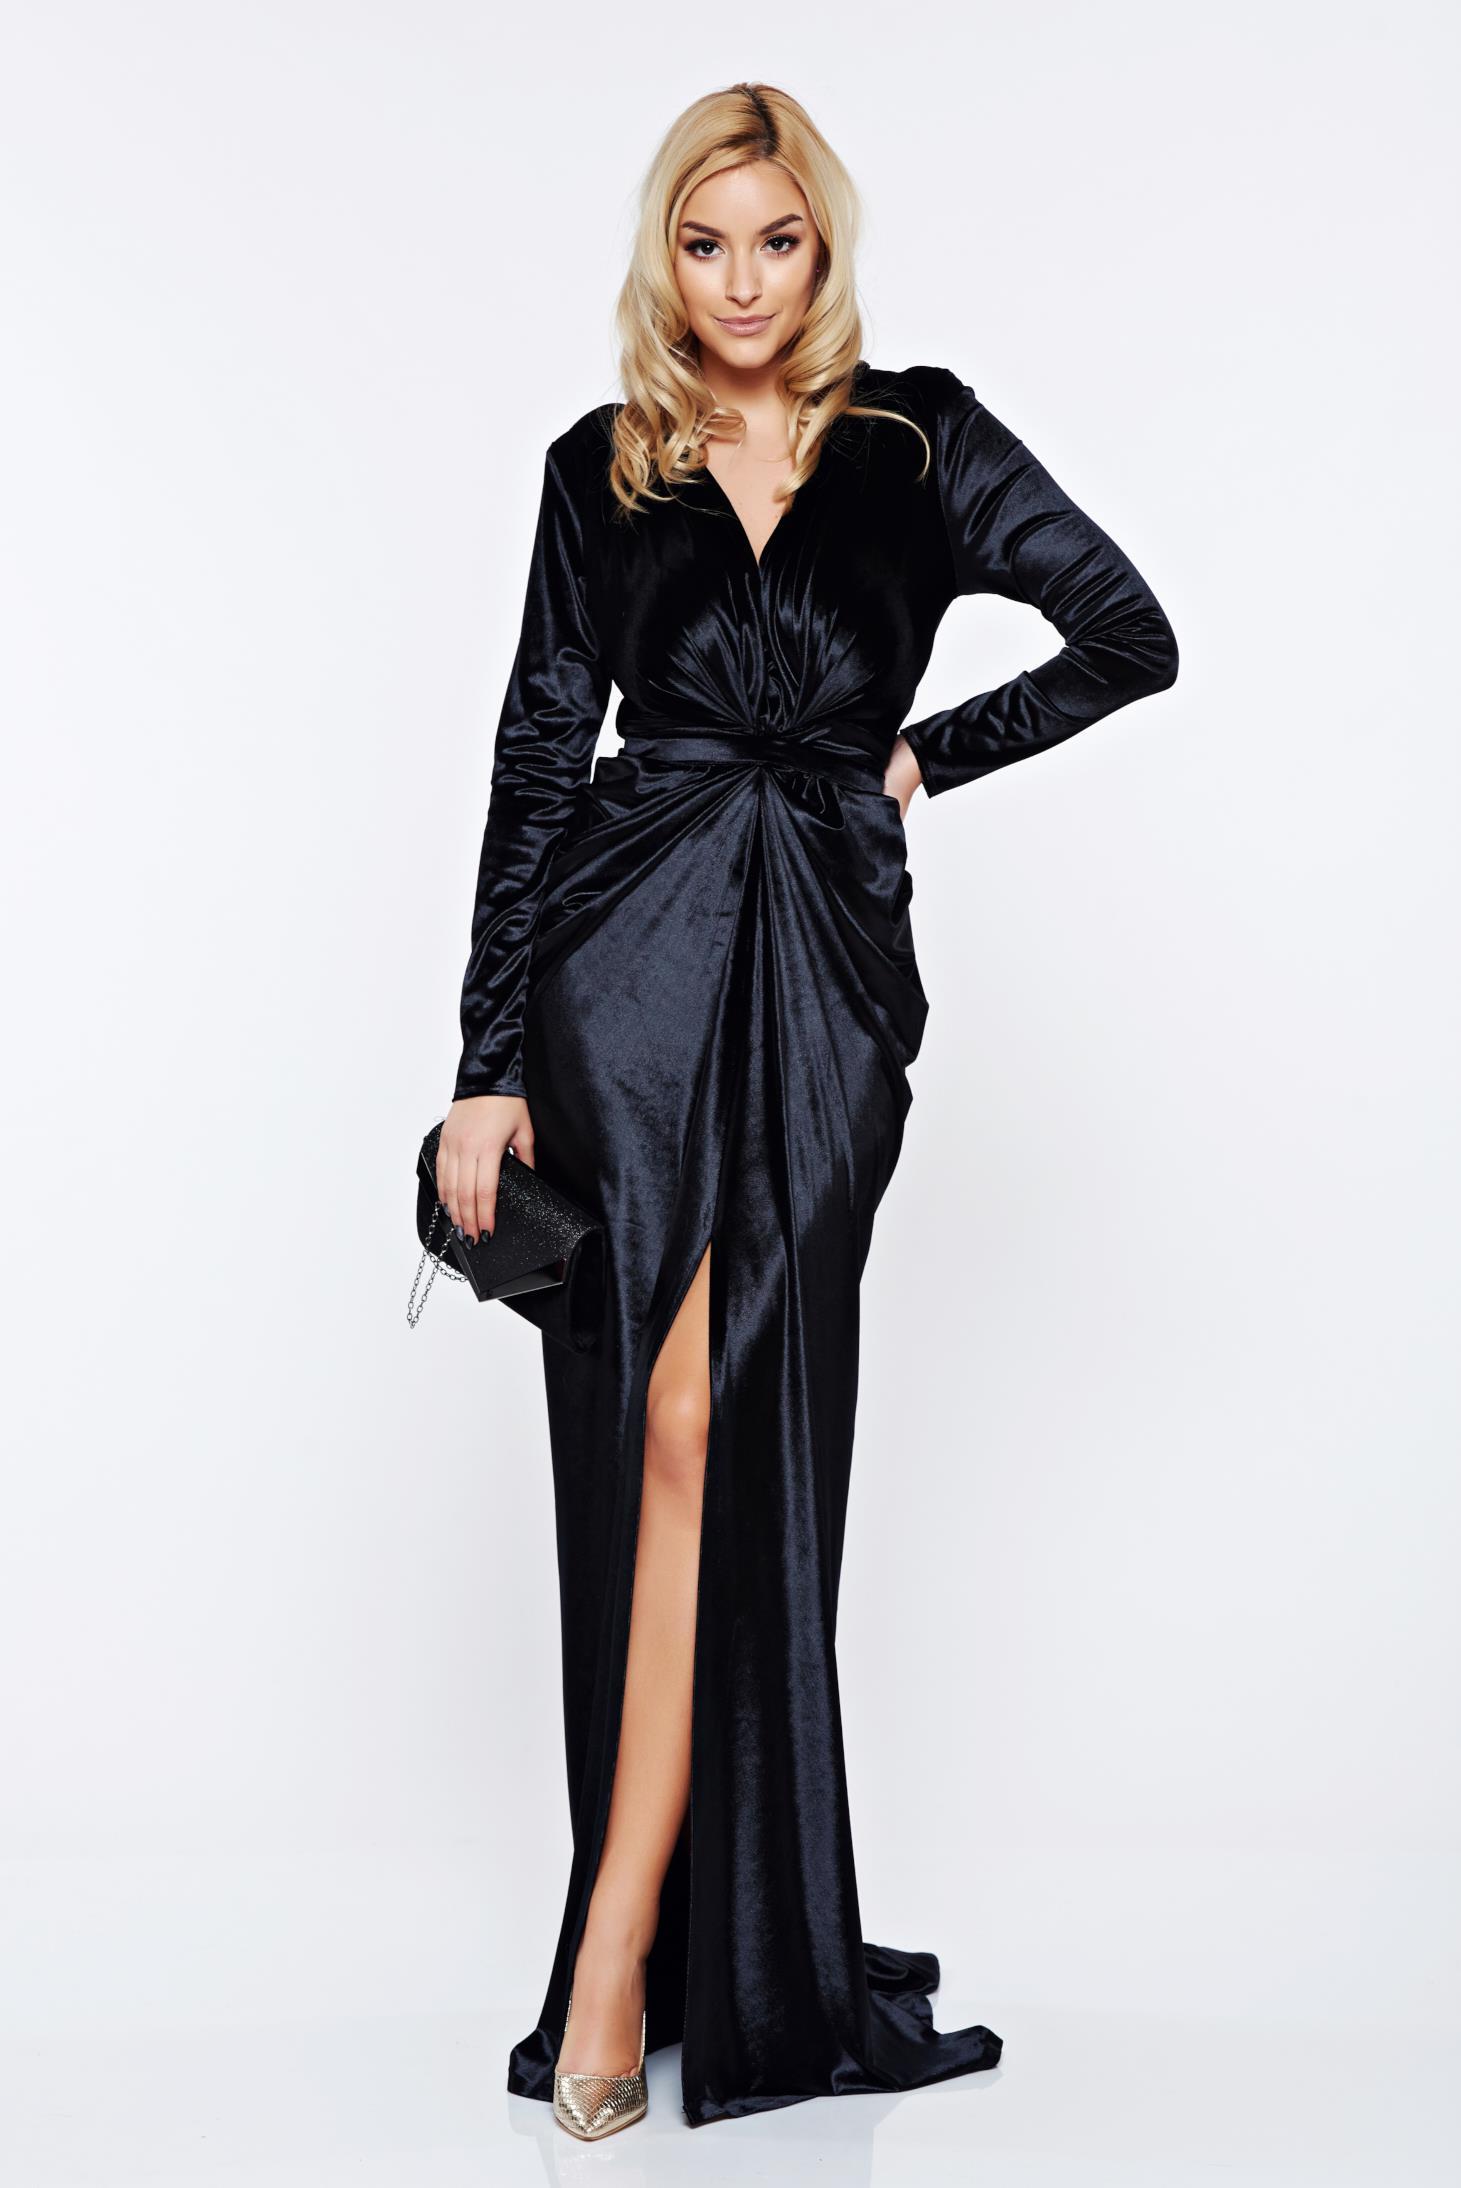 c2efe5d11f99 ana-radu-black-dress-velvet-mermaid-with-deep-clea-S033347-2-325839.jpg